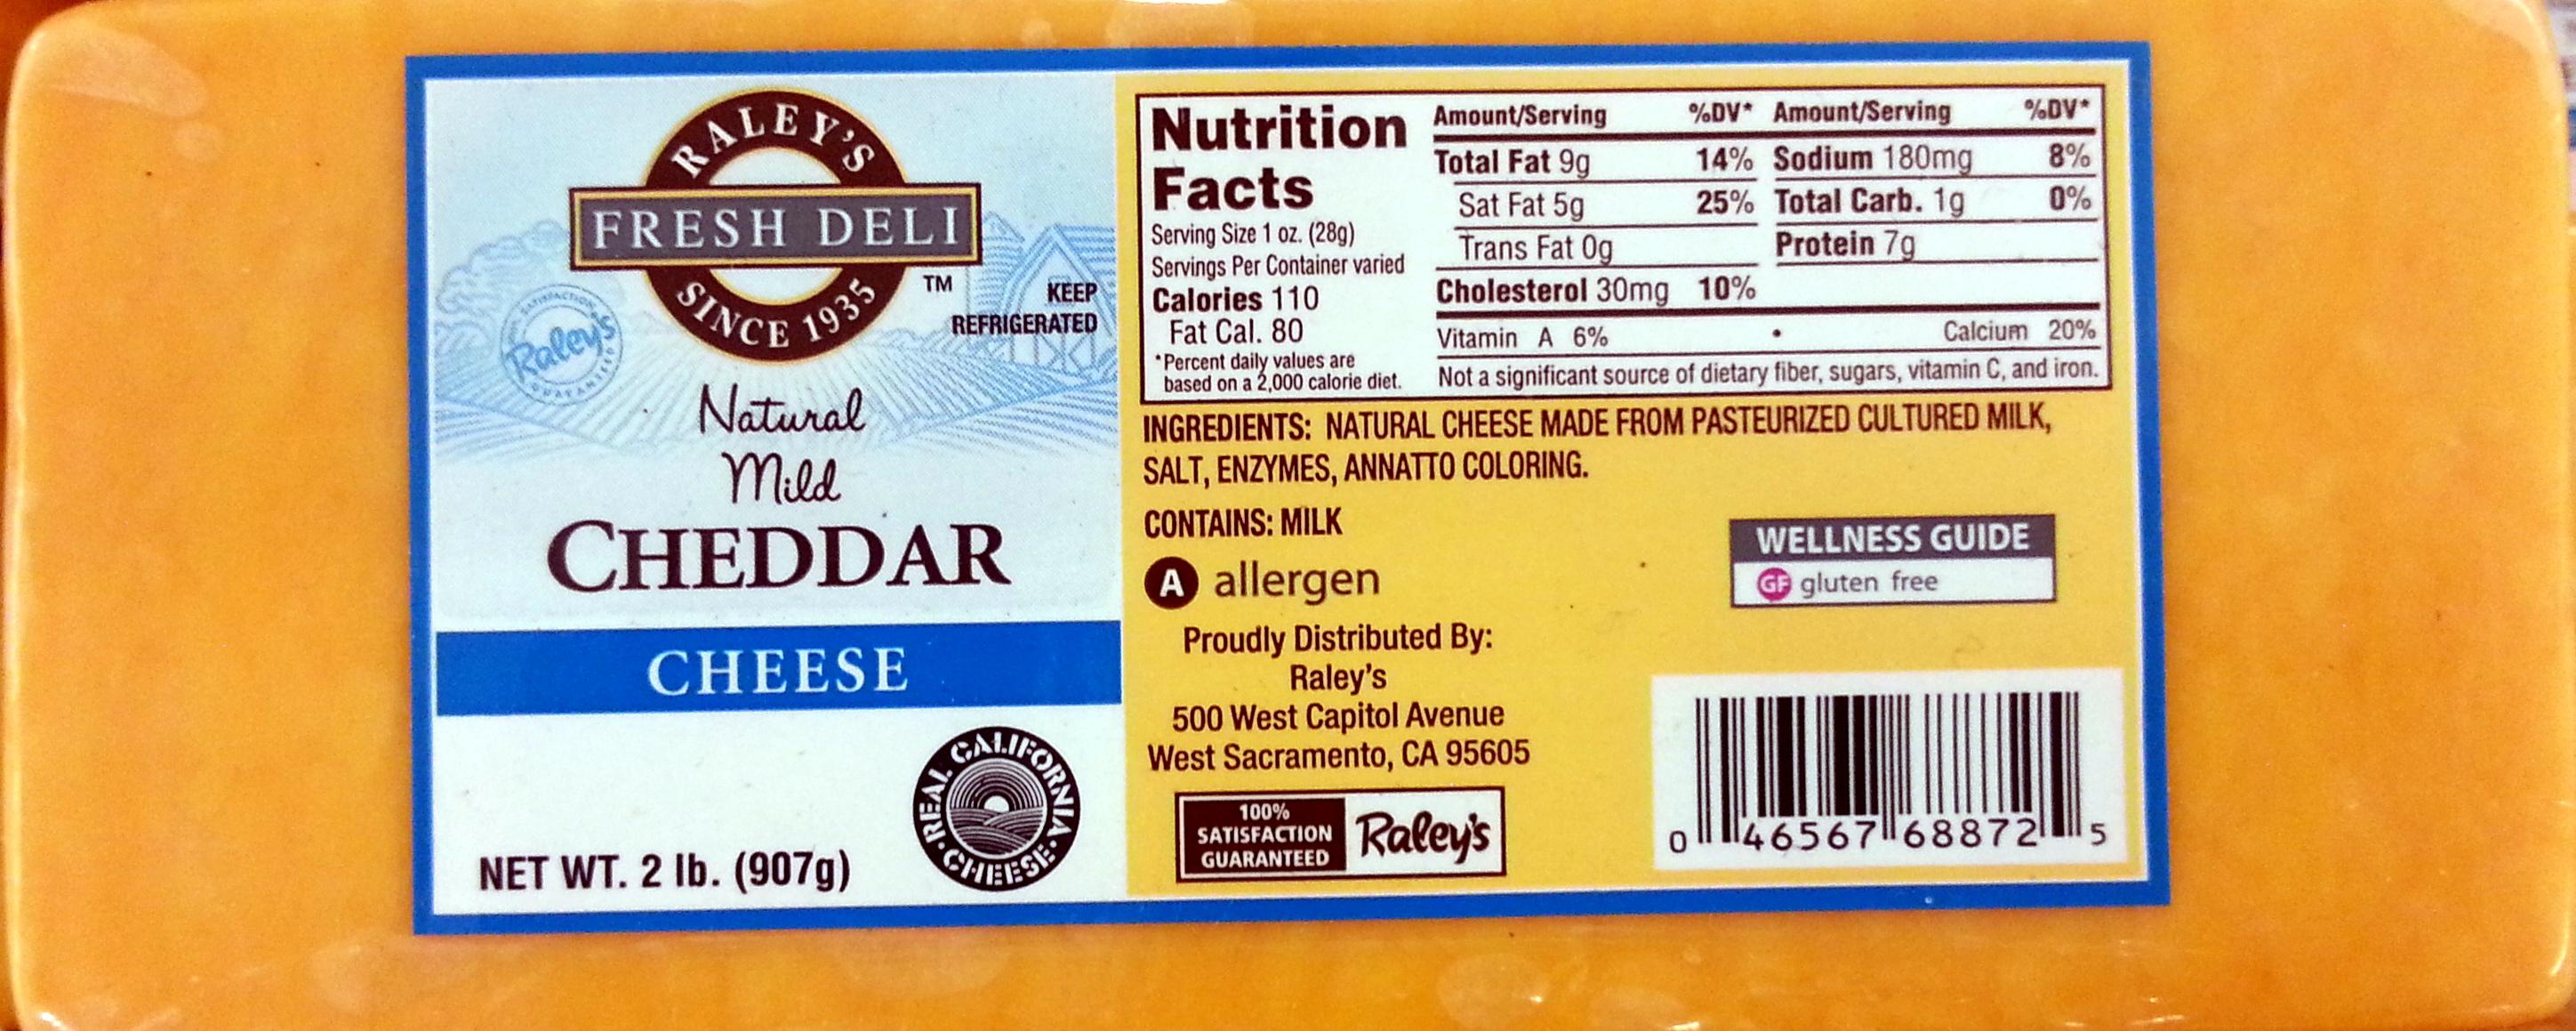 Natural Mild Cheddar Cheese